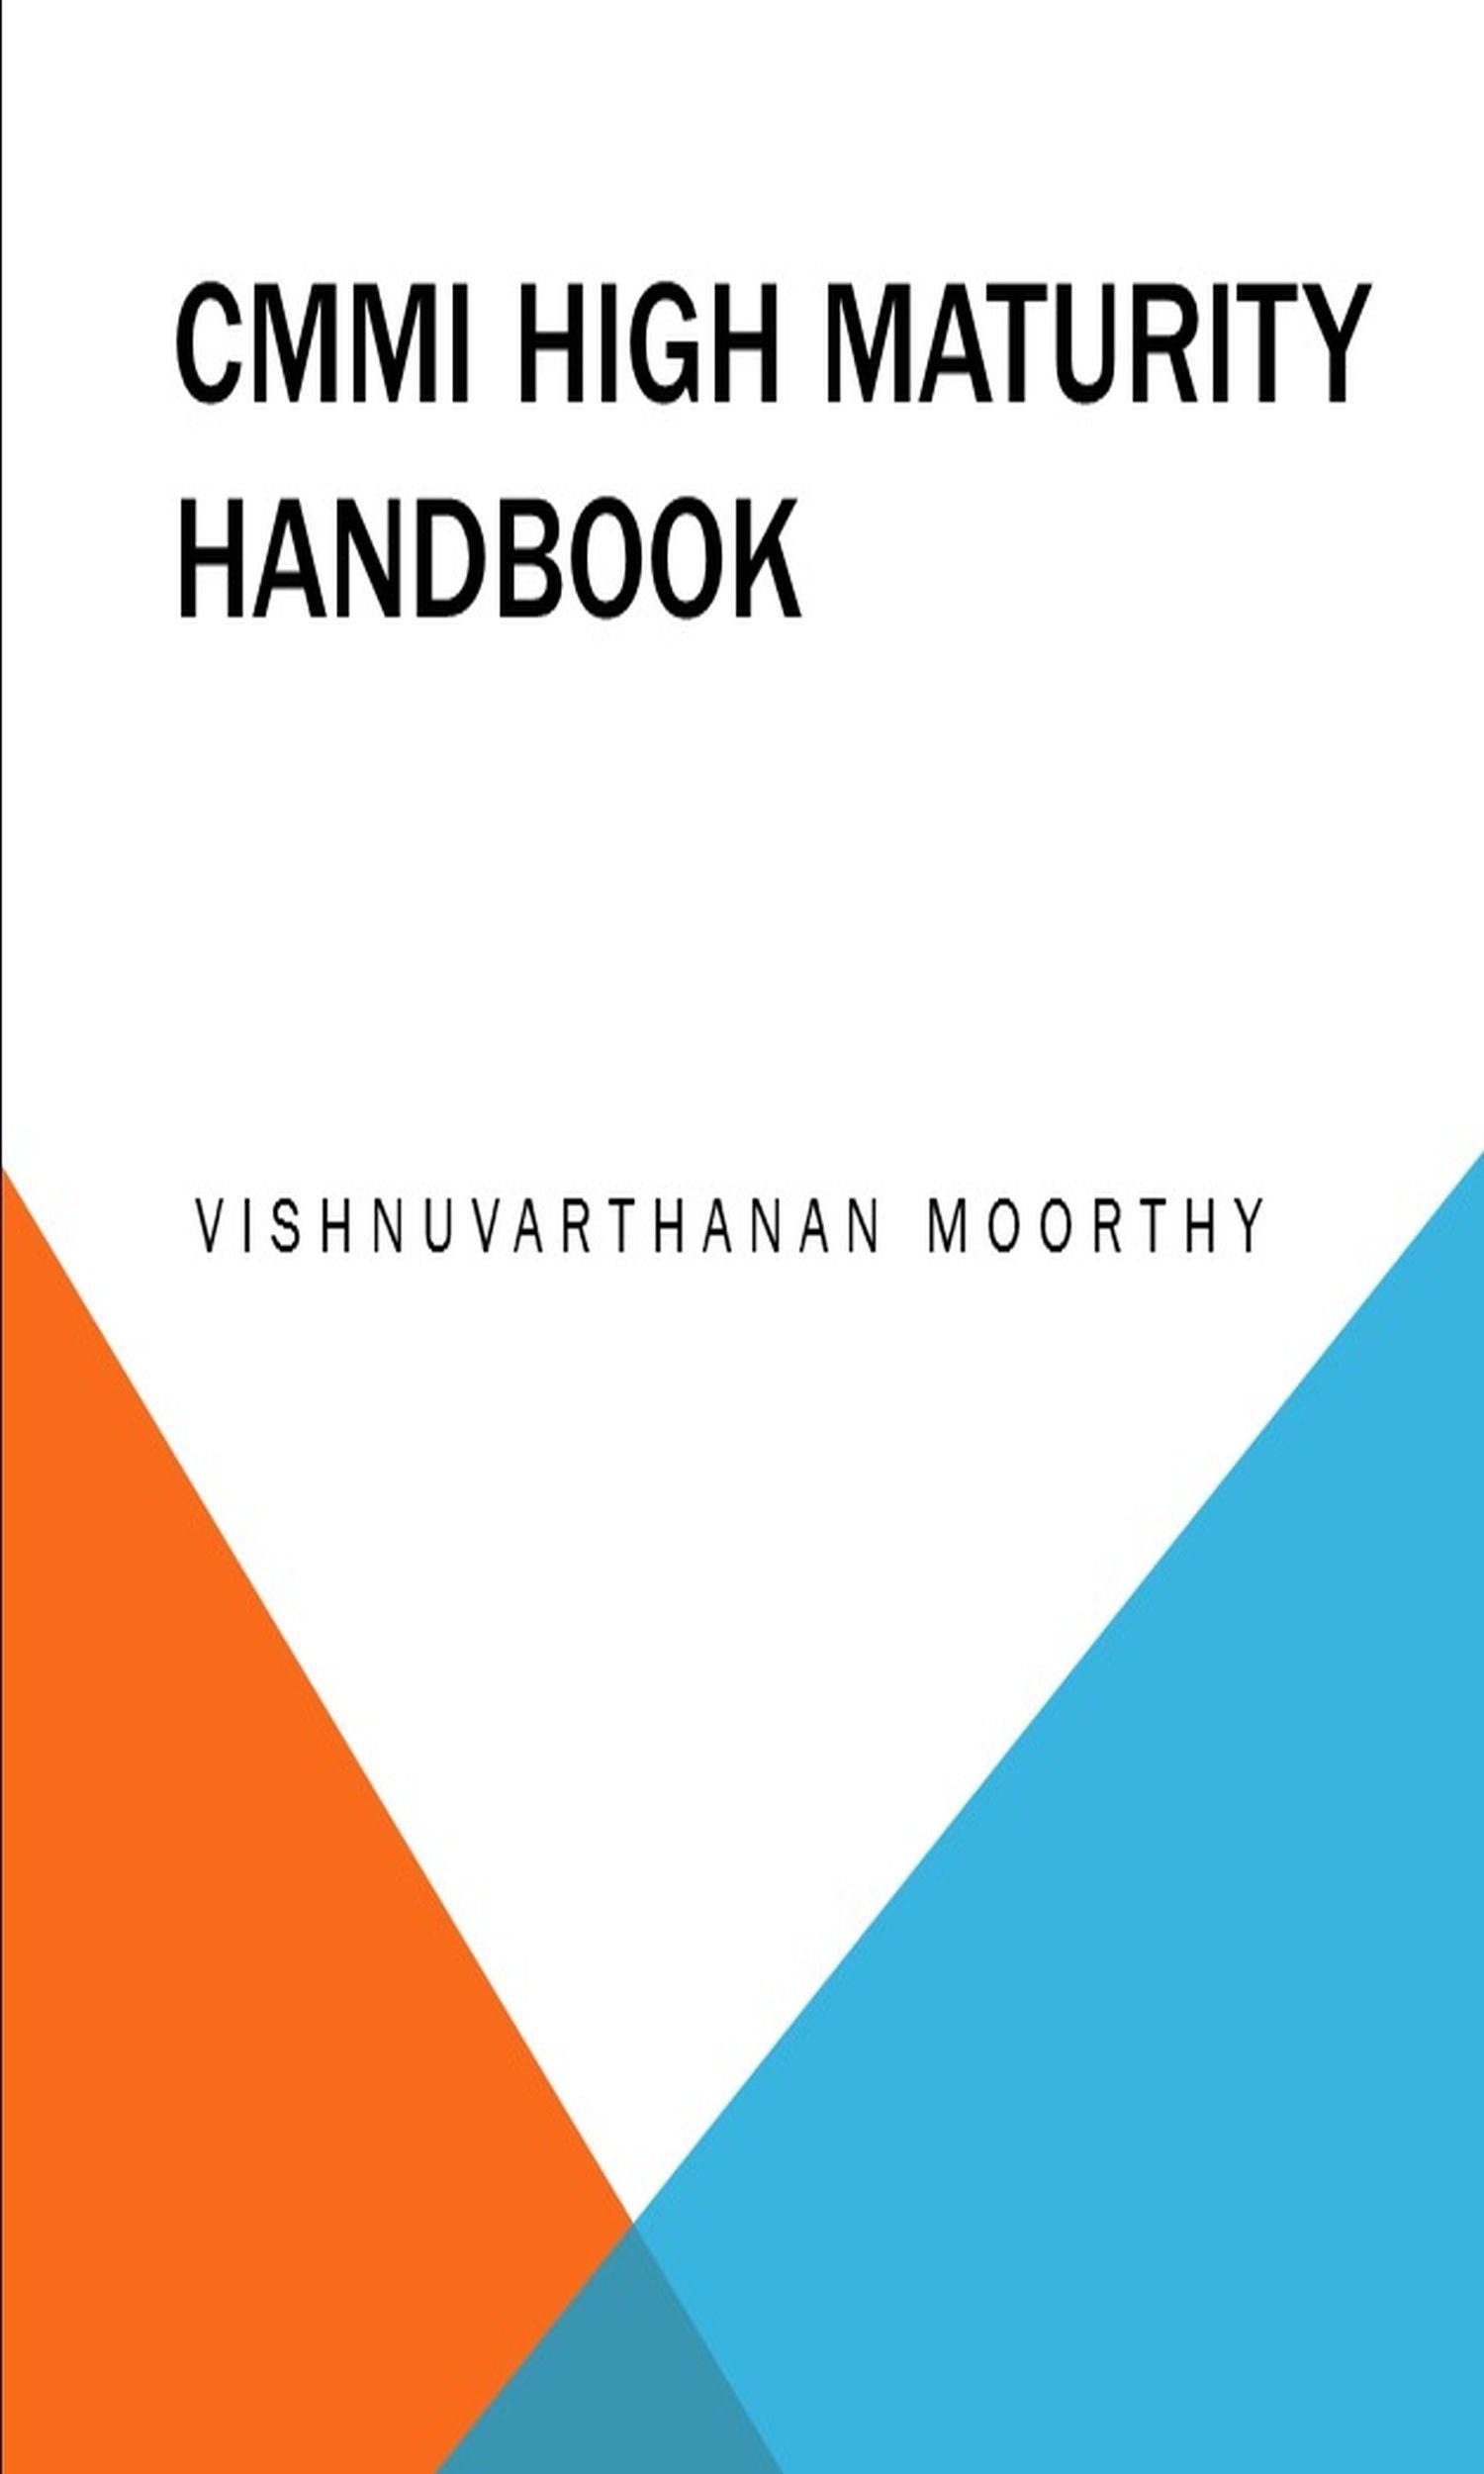 CMMI High Maturity Hand Book  by  Vishnuvarthanan Moorthy